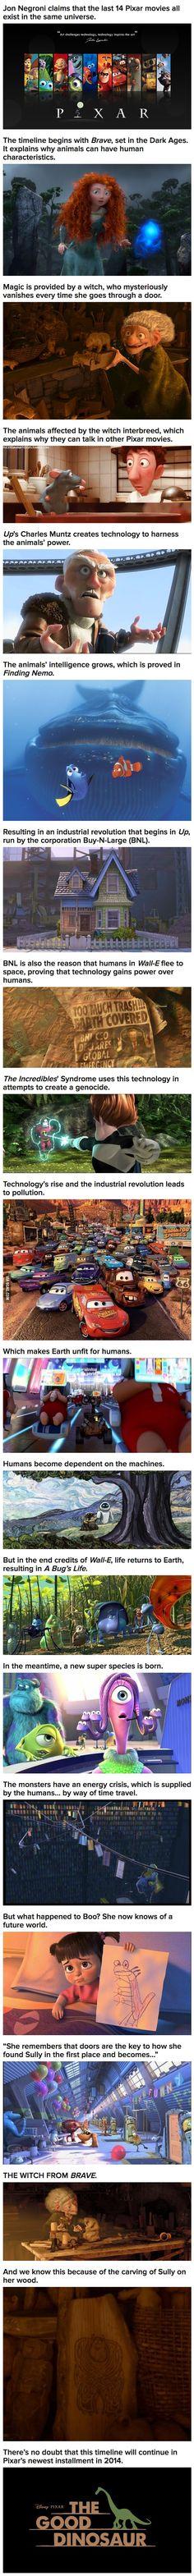 Pixar movies explained. I think.... I think my mind just exploded....